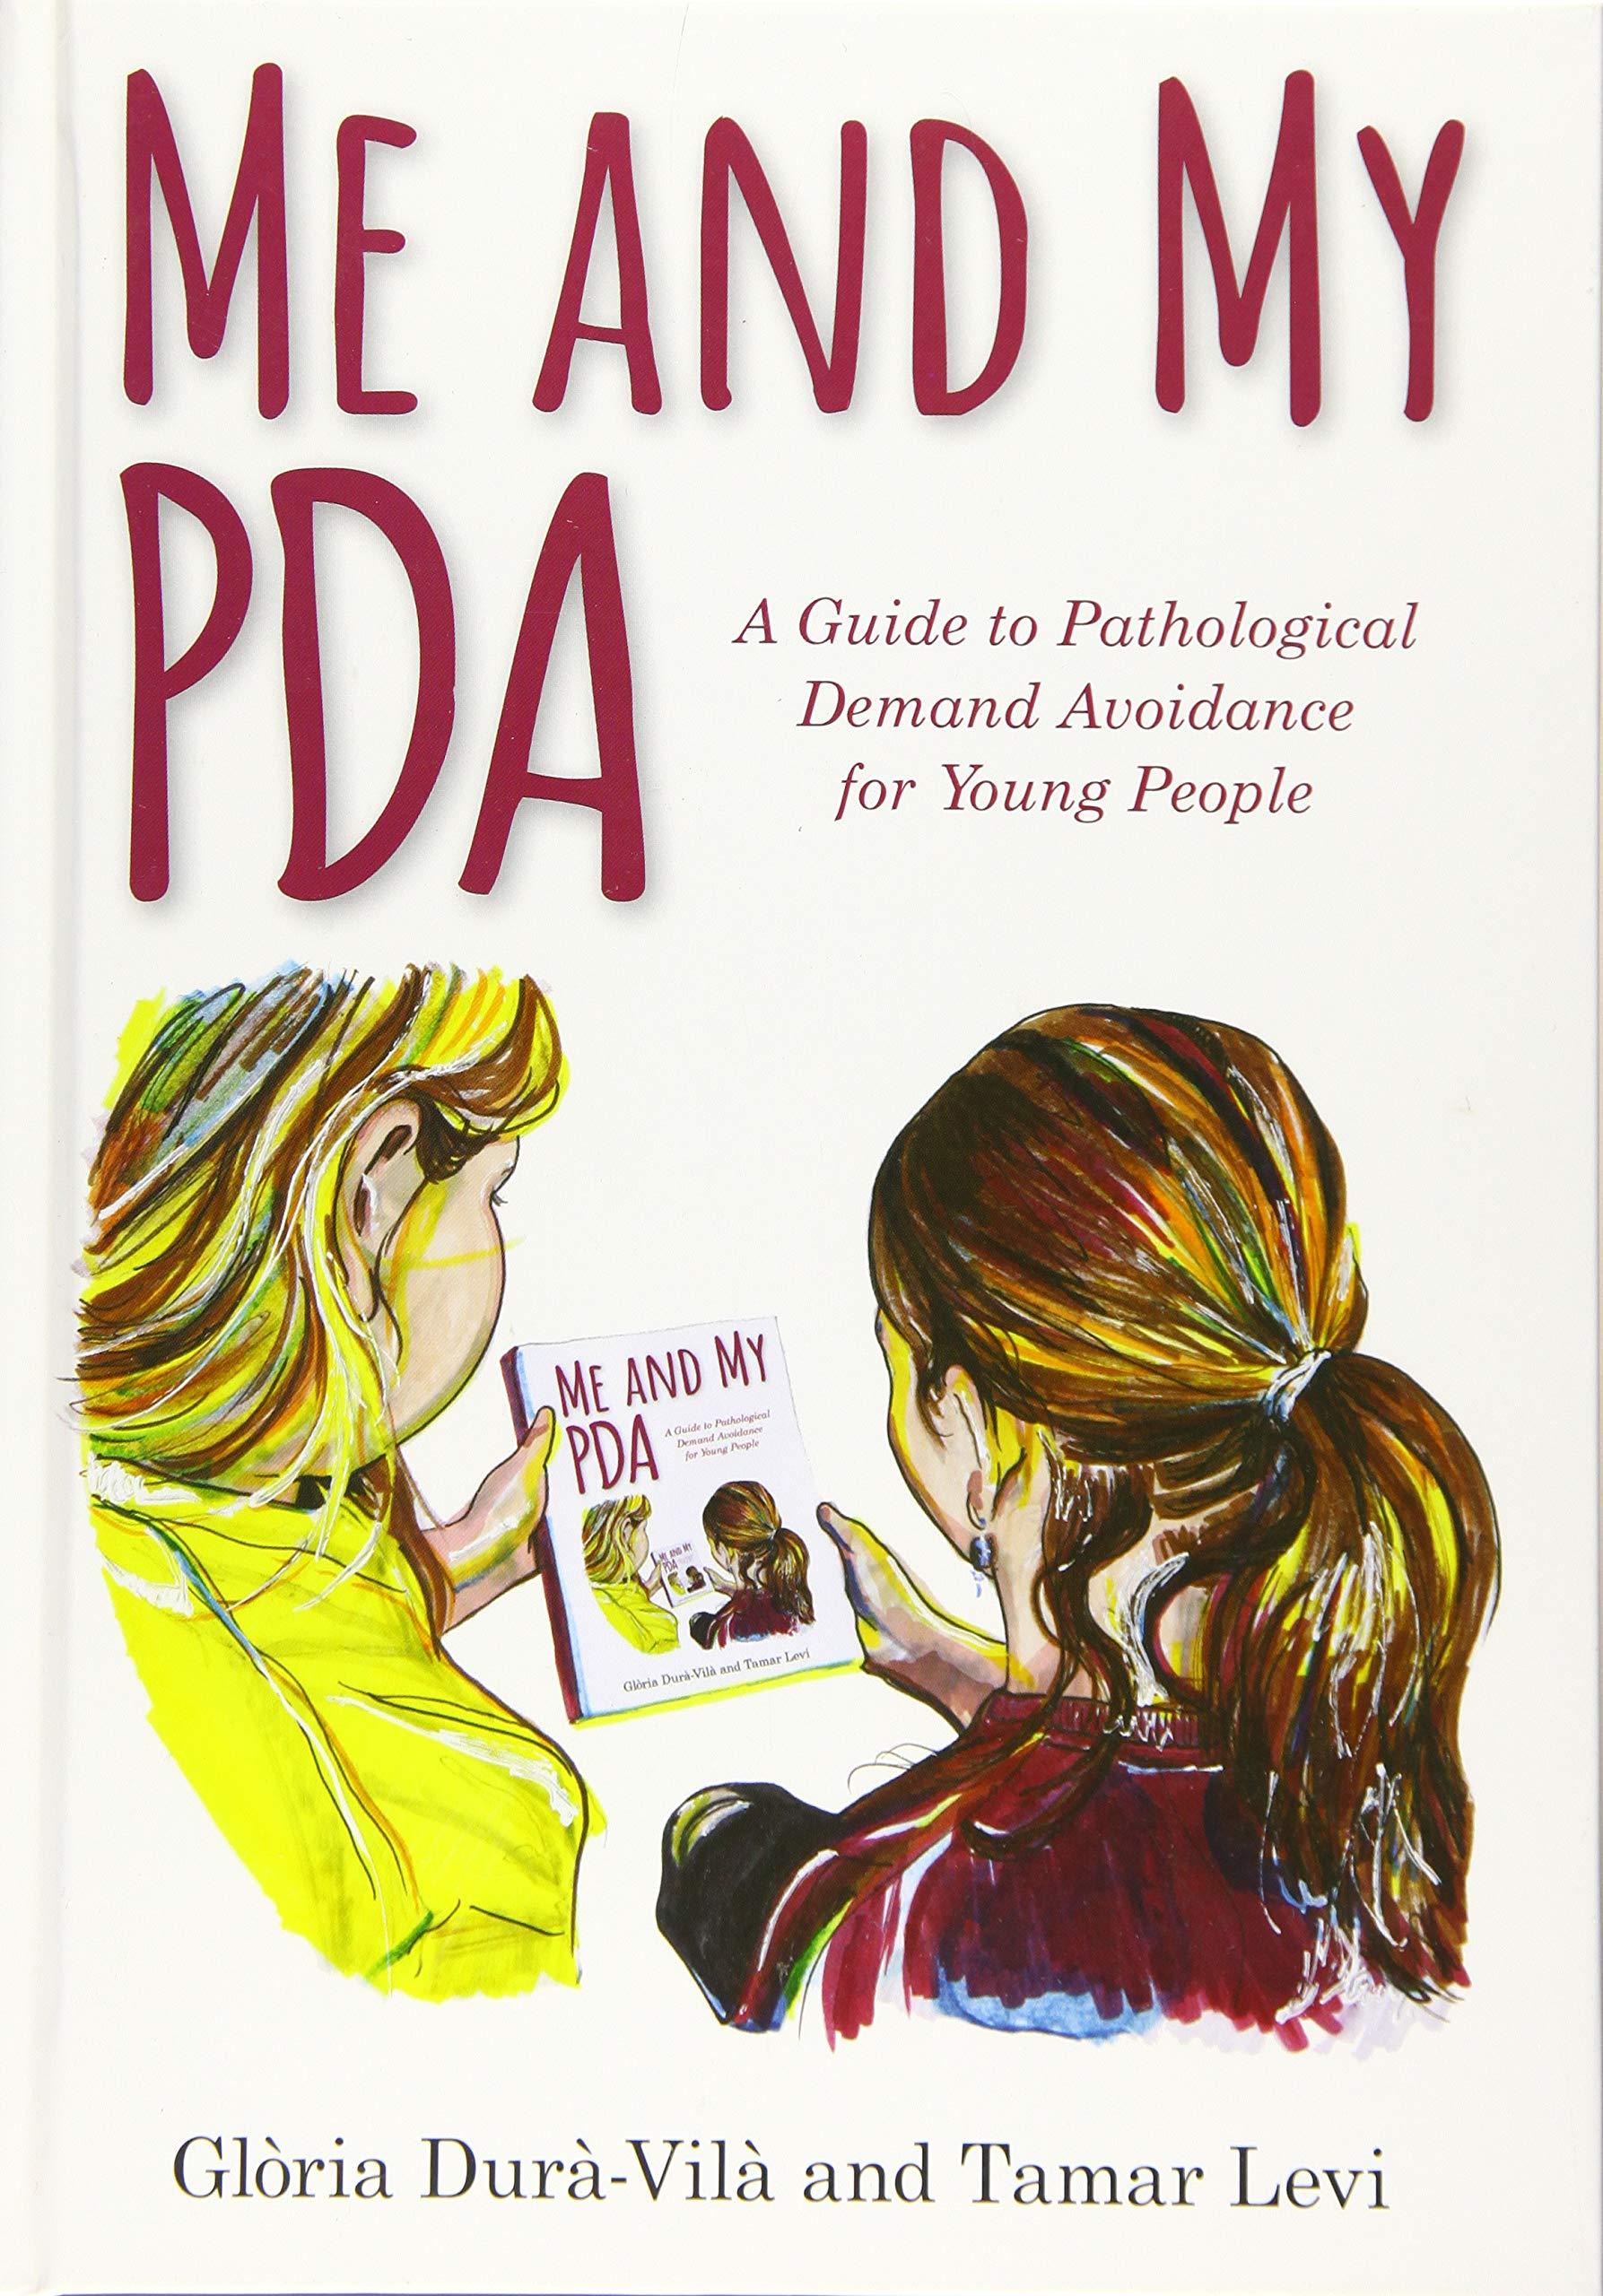 Me My PDA Pathological Avoidance